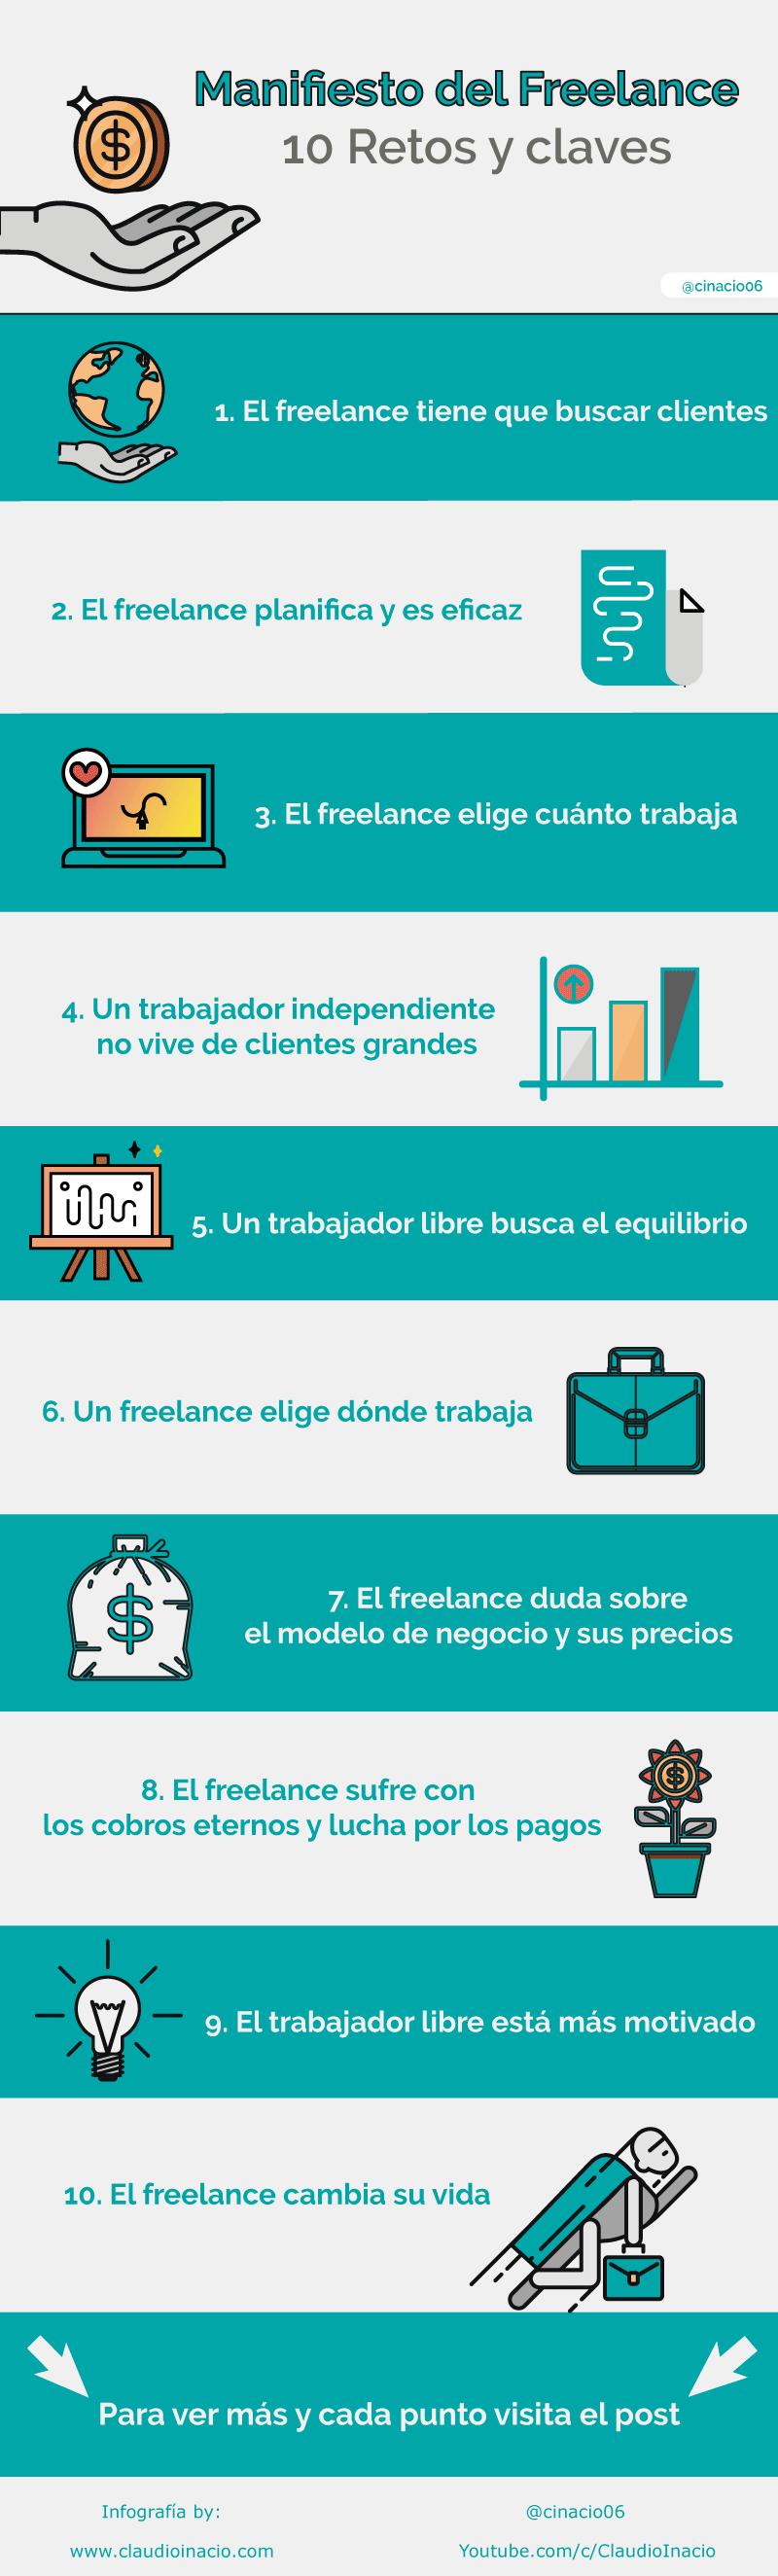 10 puntos clave del Manifiesto Freelance #infografia #infographic #Empleo